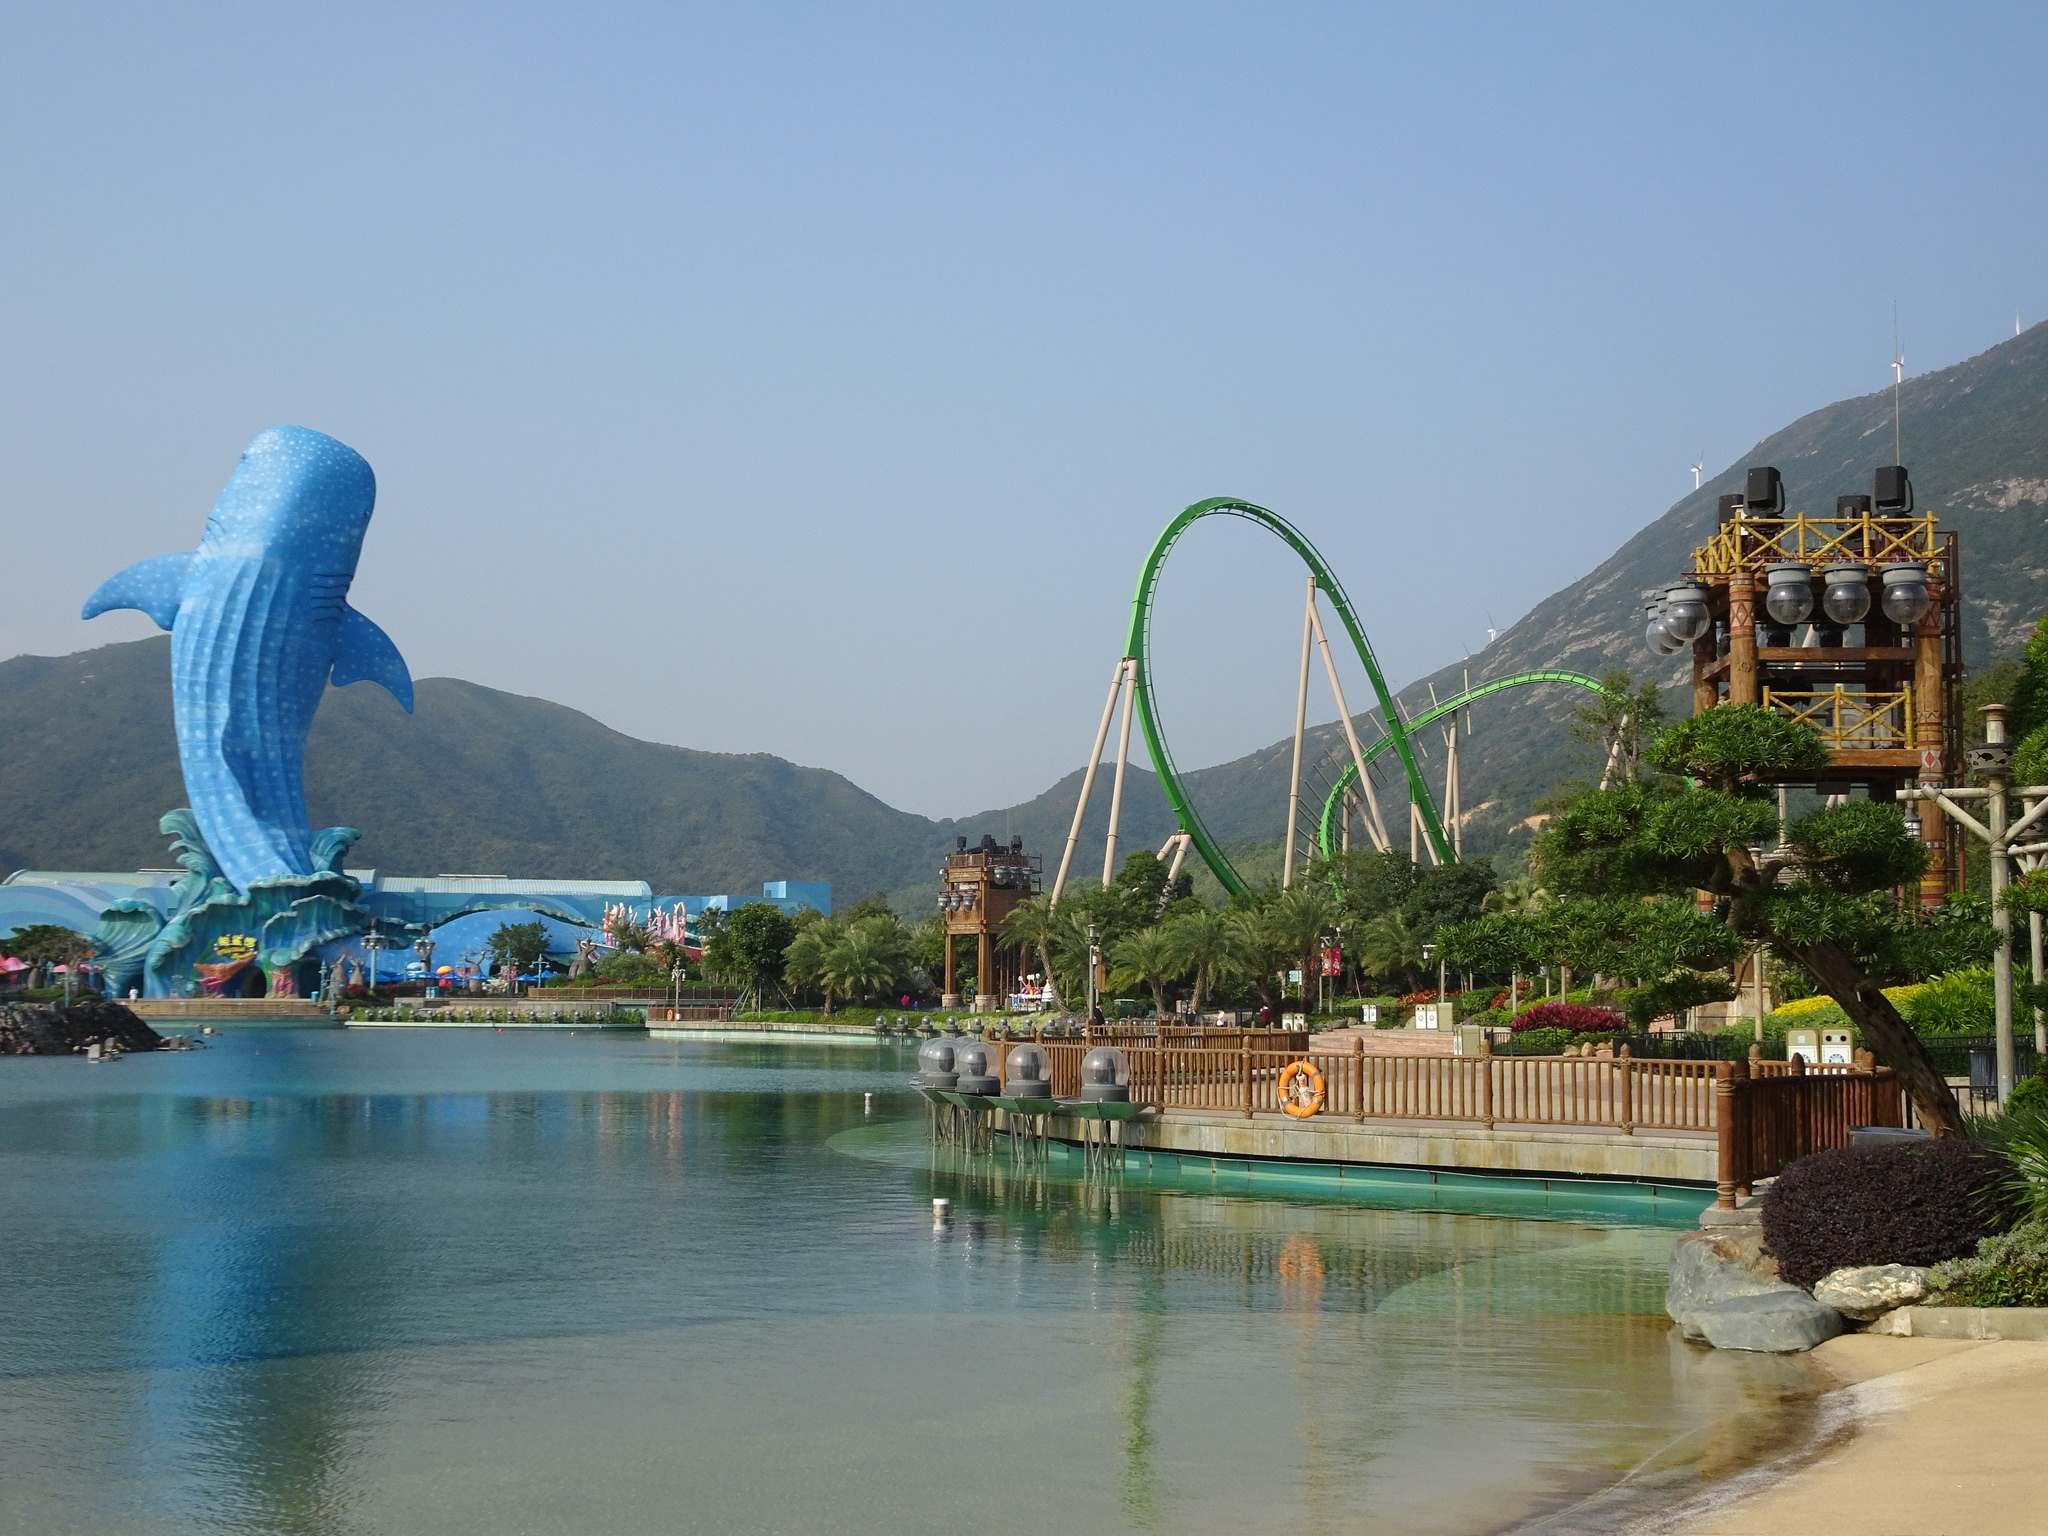 Chimelong Ocean Kingdom Worlds Largest Aquarium